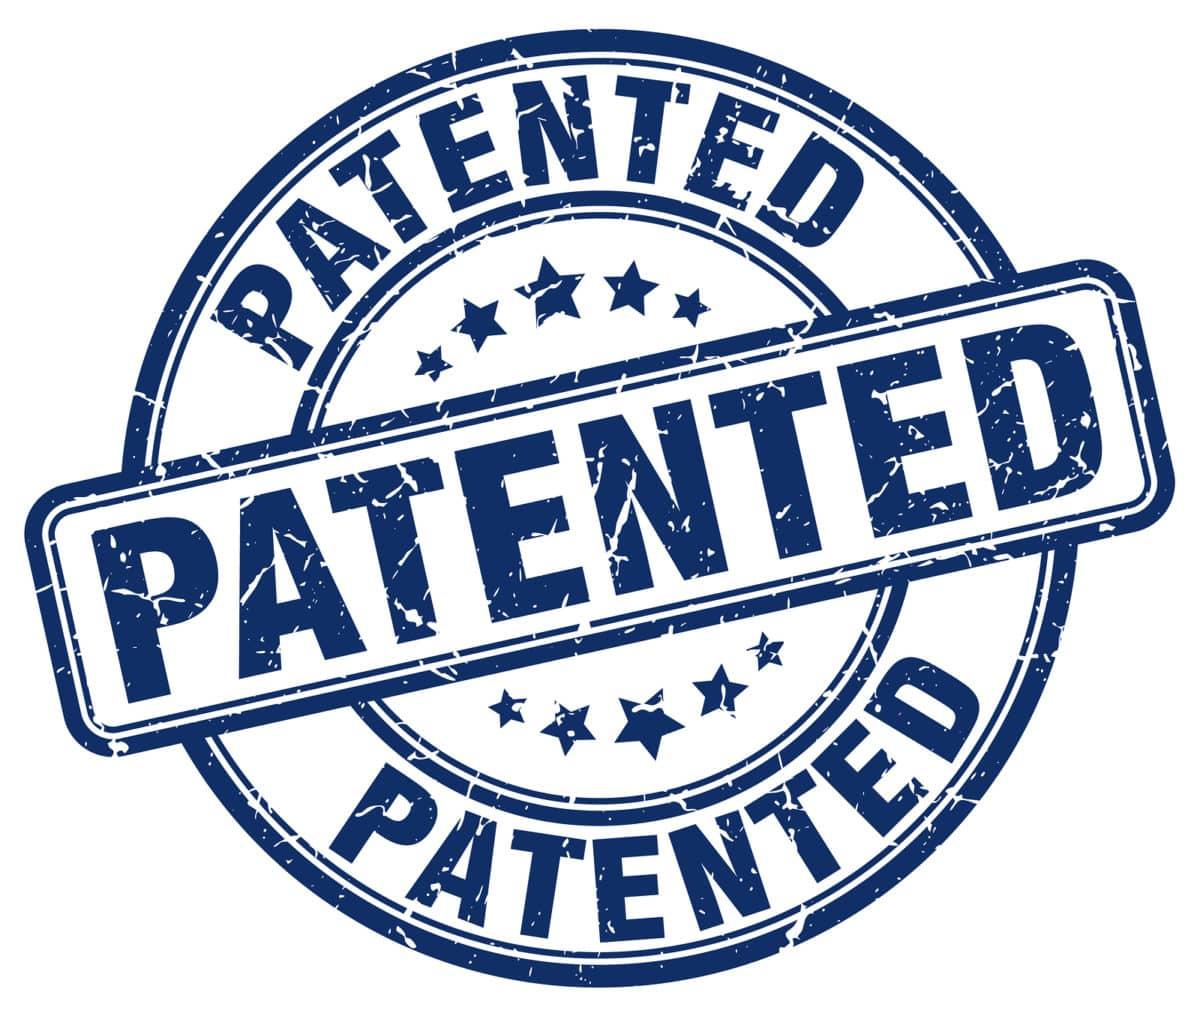 Idea Design Studio Reveals Criteria and Tools for Receiving a Patent